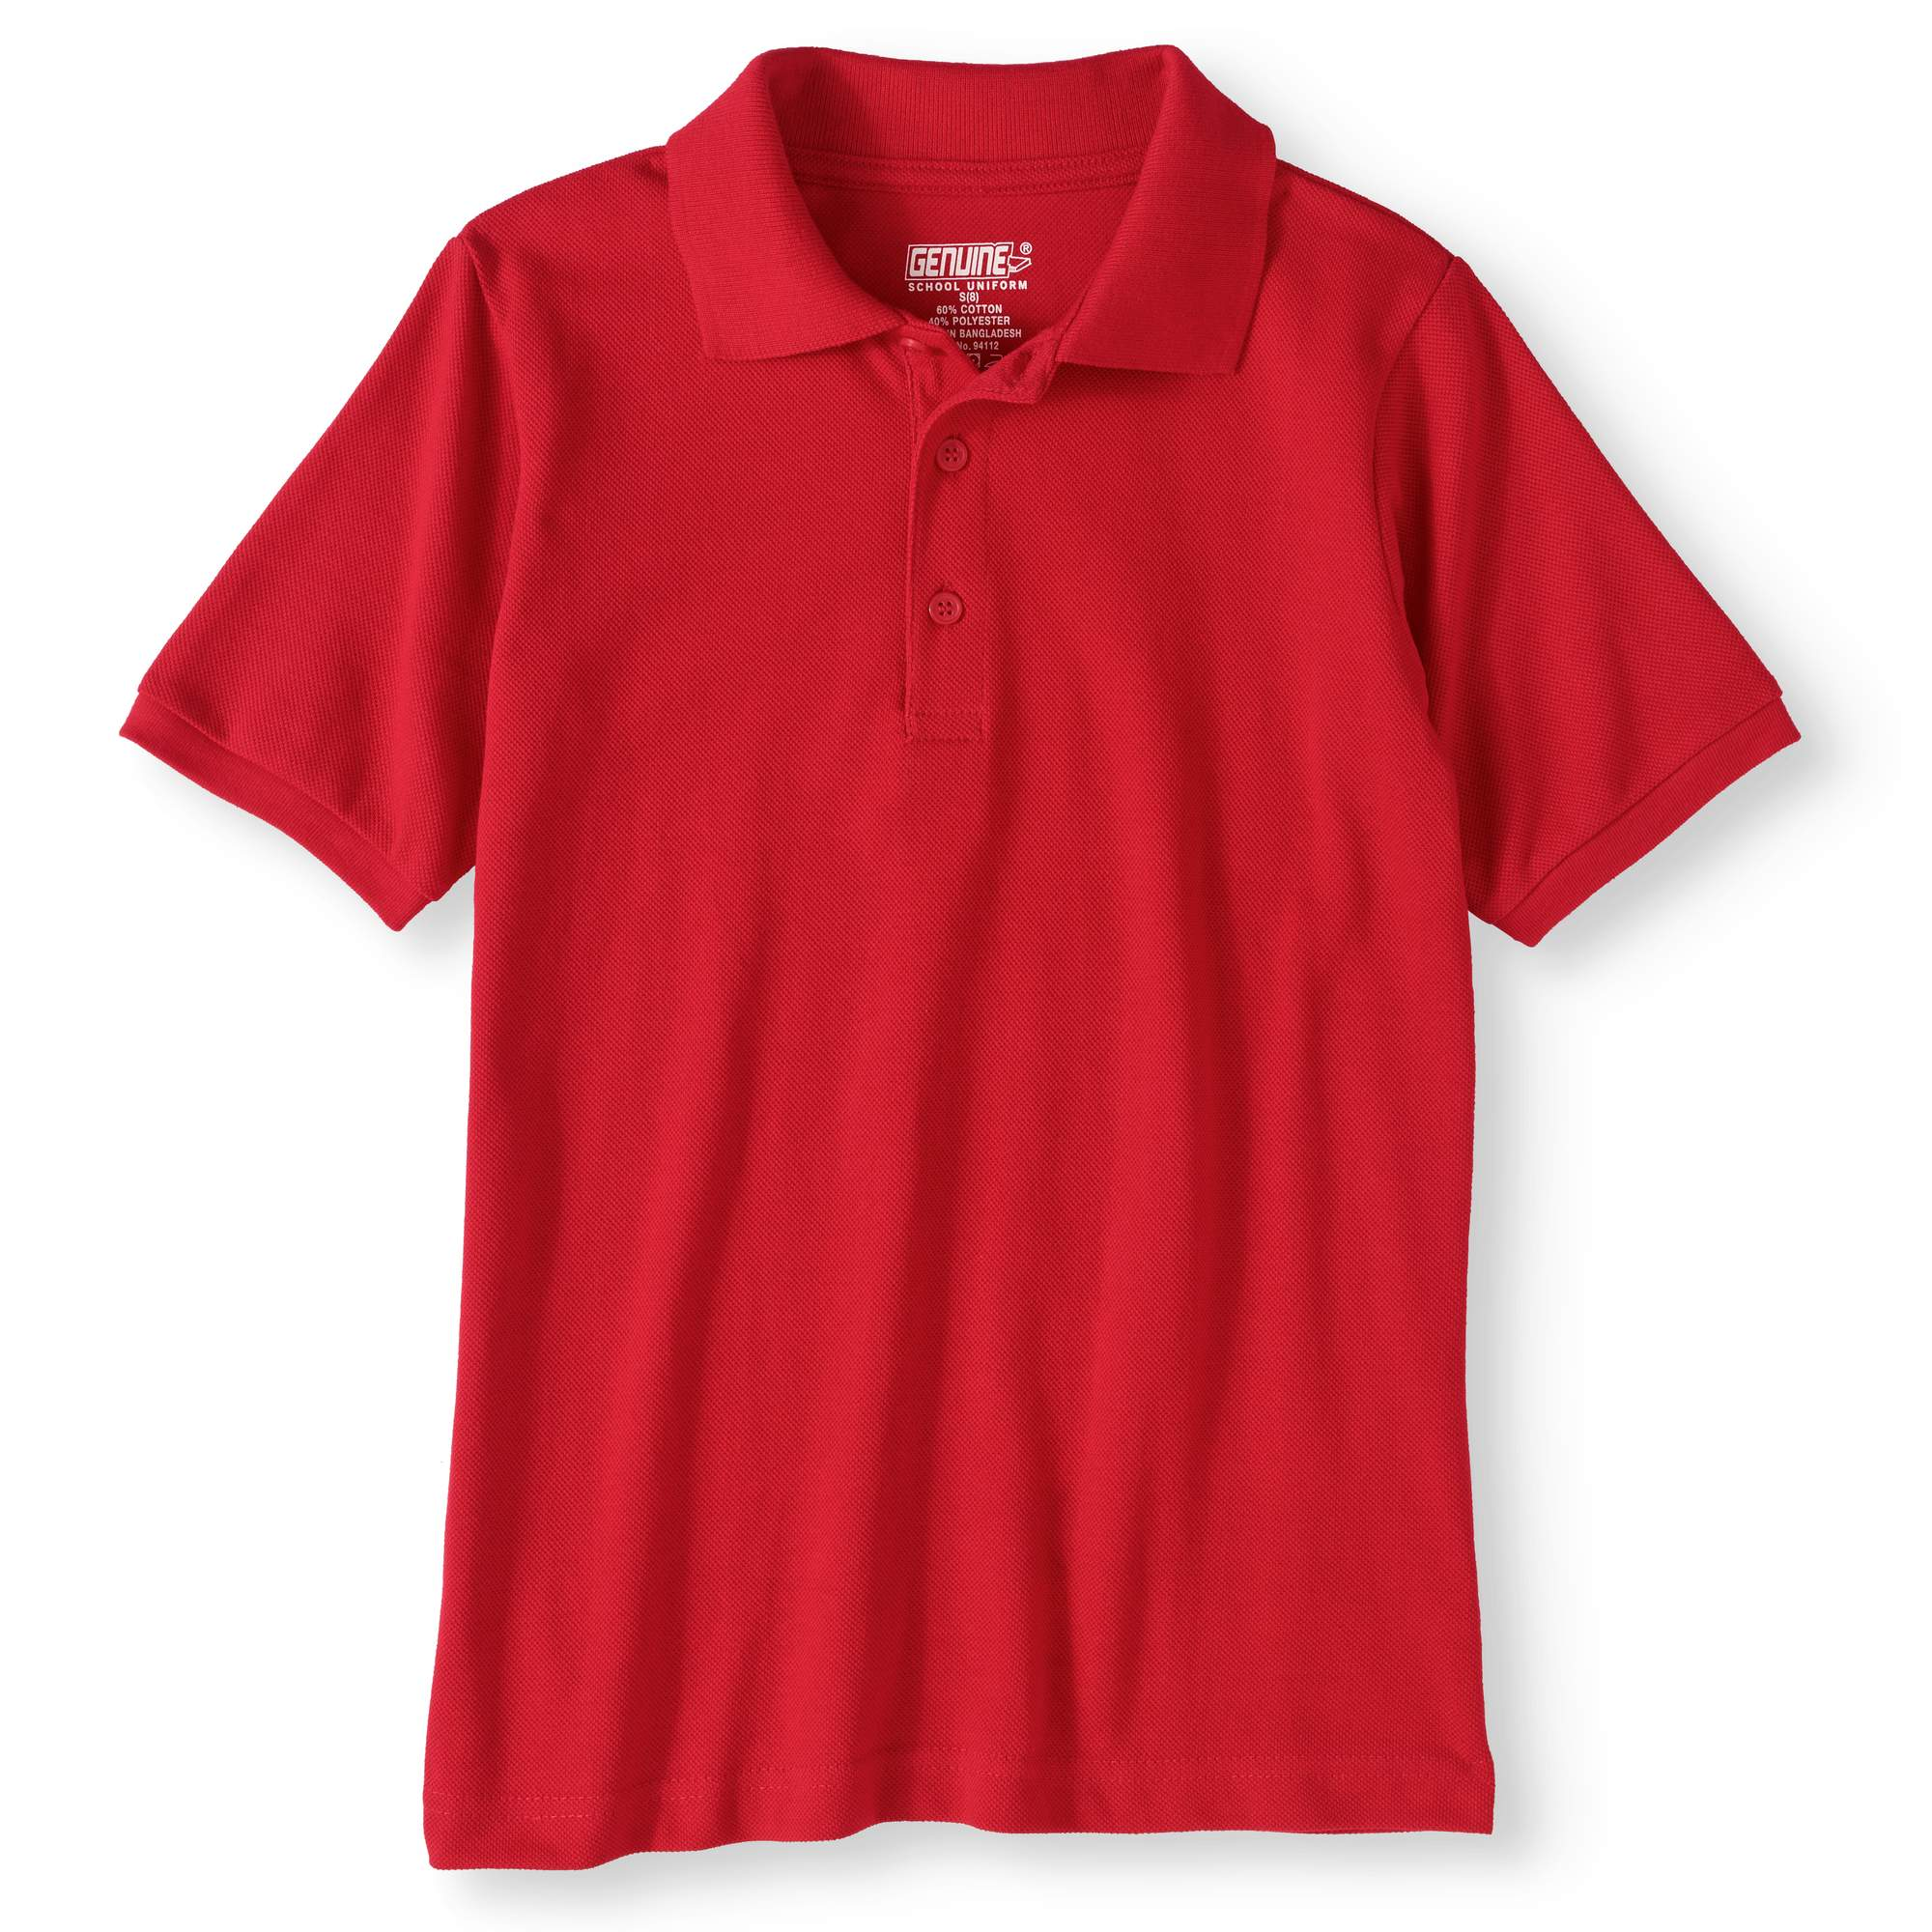 Genuine Uniform Boys' Short Sleeve Polo